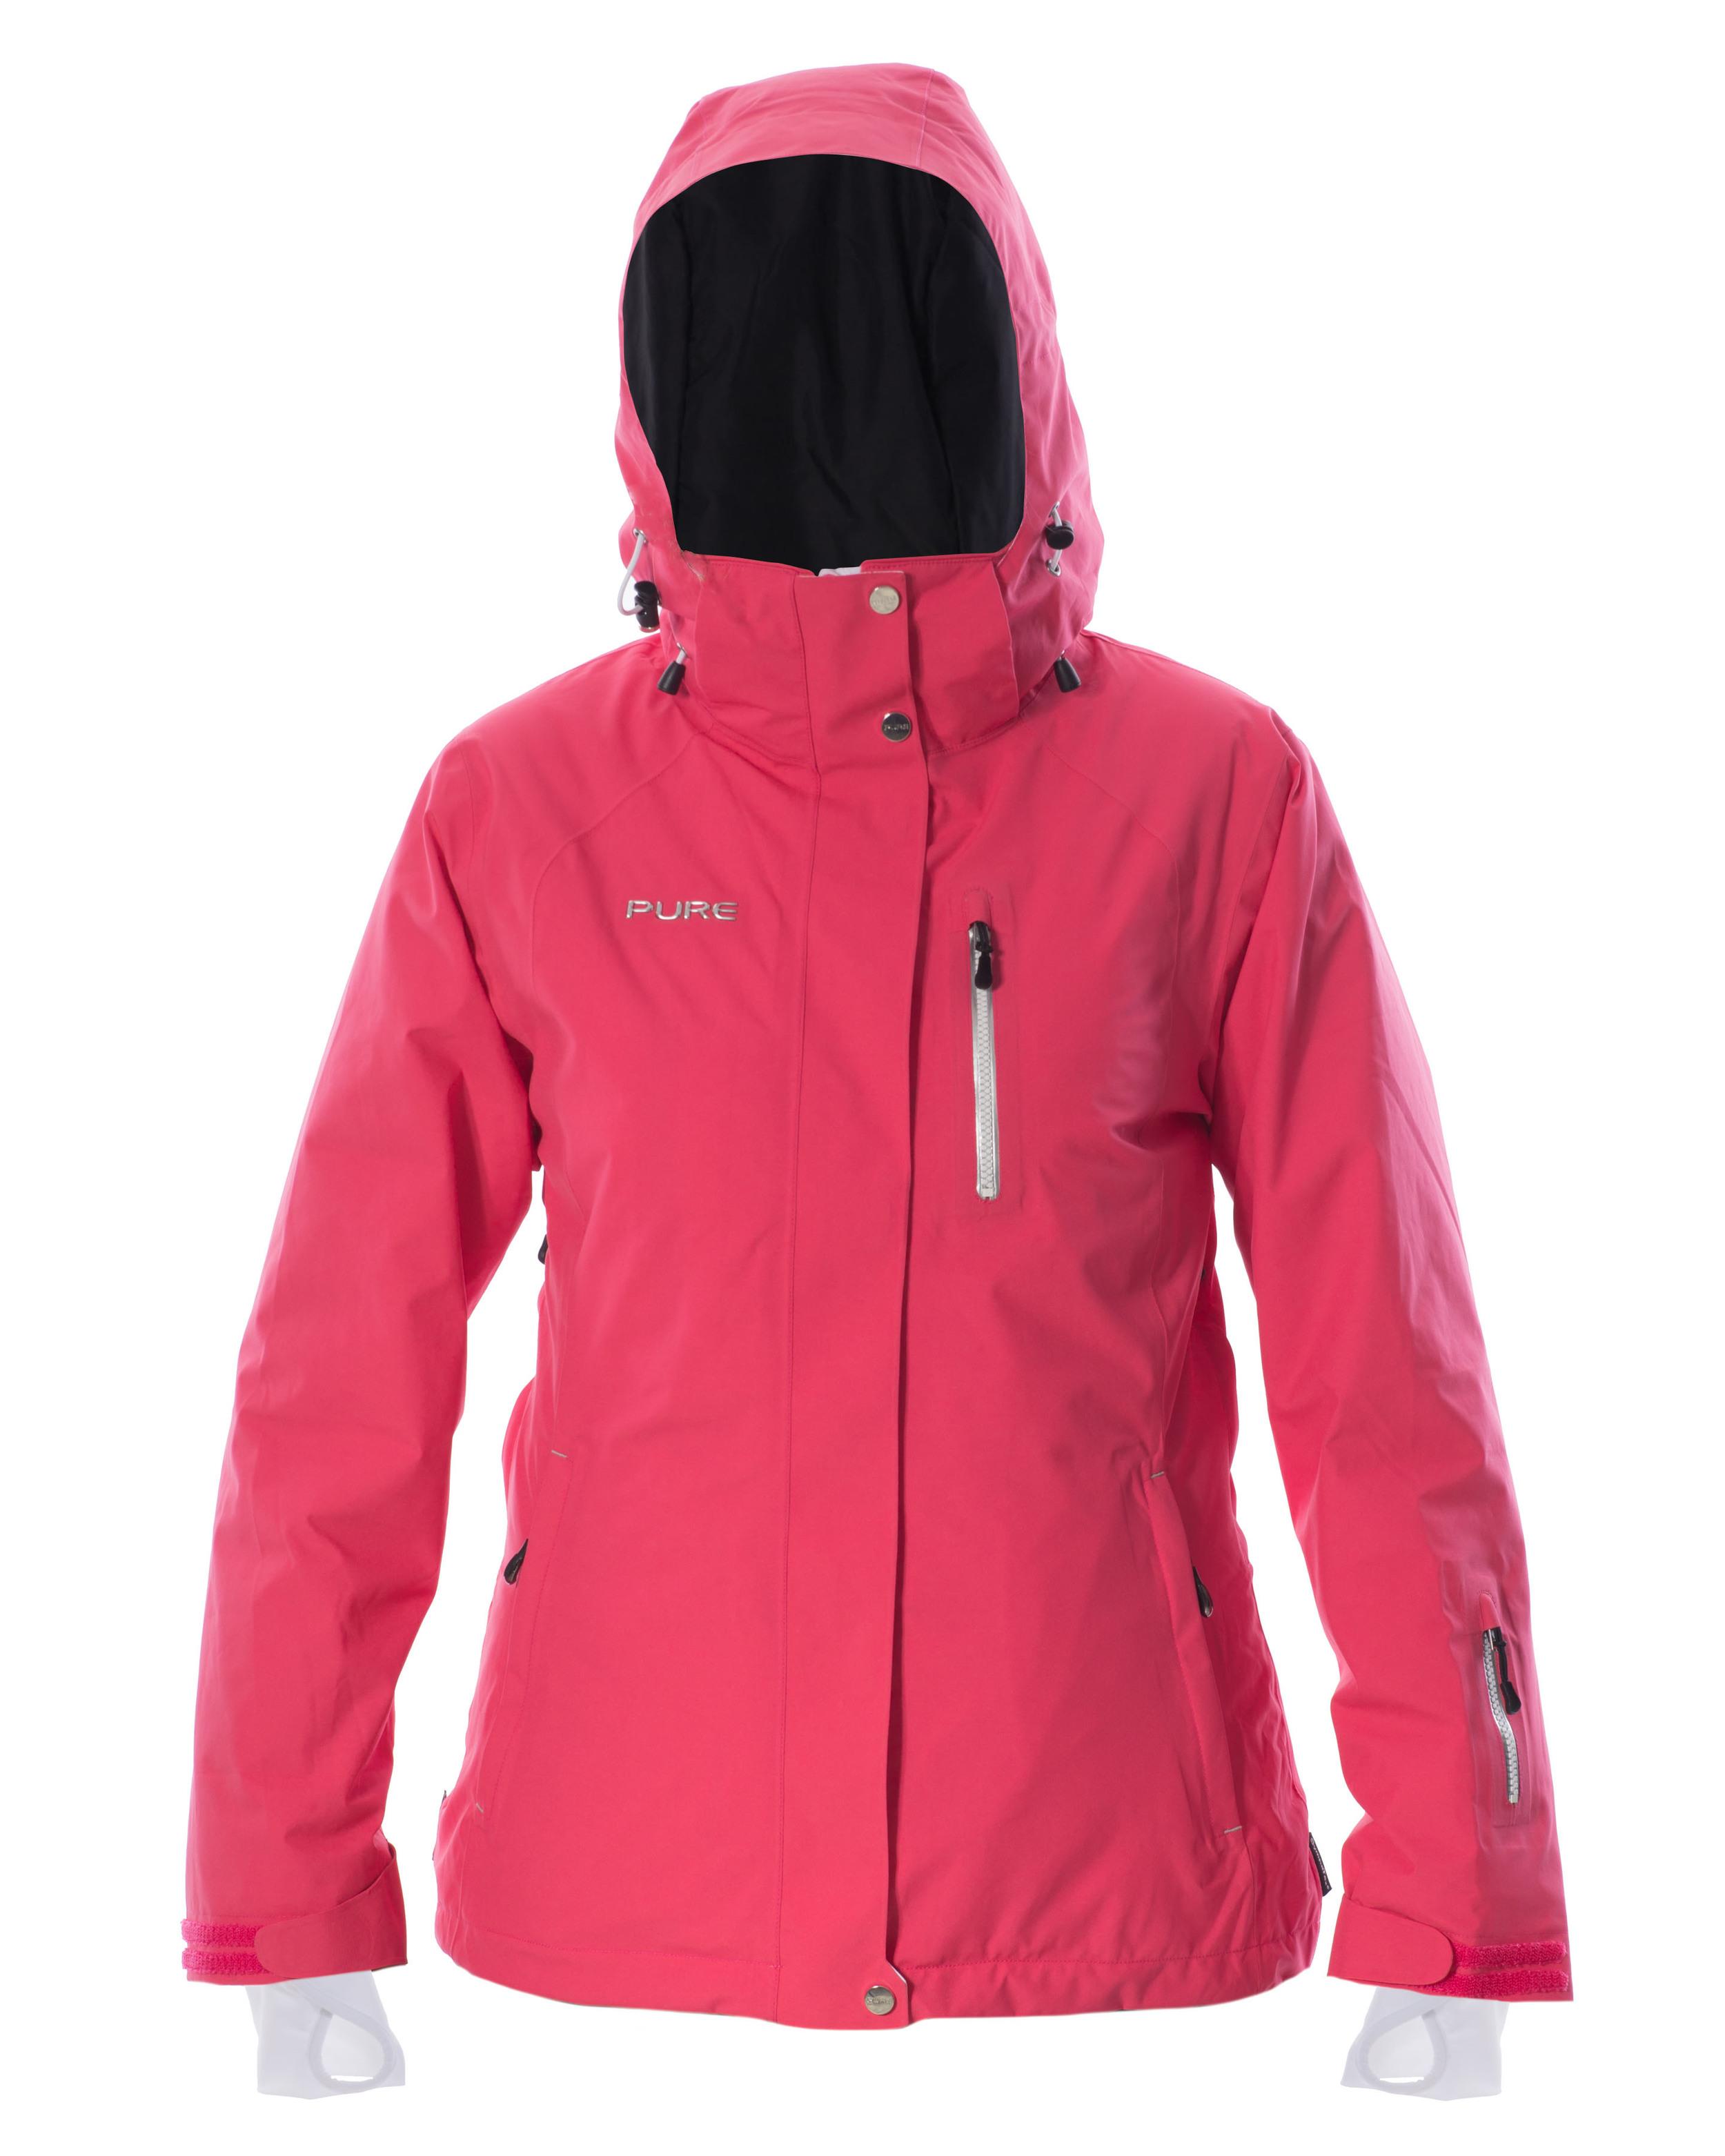 Chamonix Women's Pure Snow - Raspberry